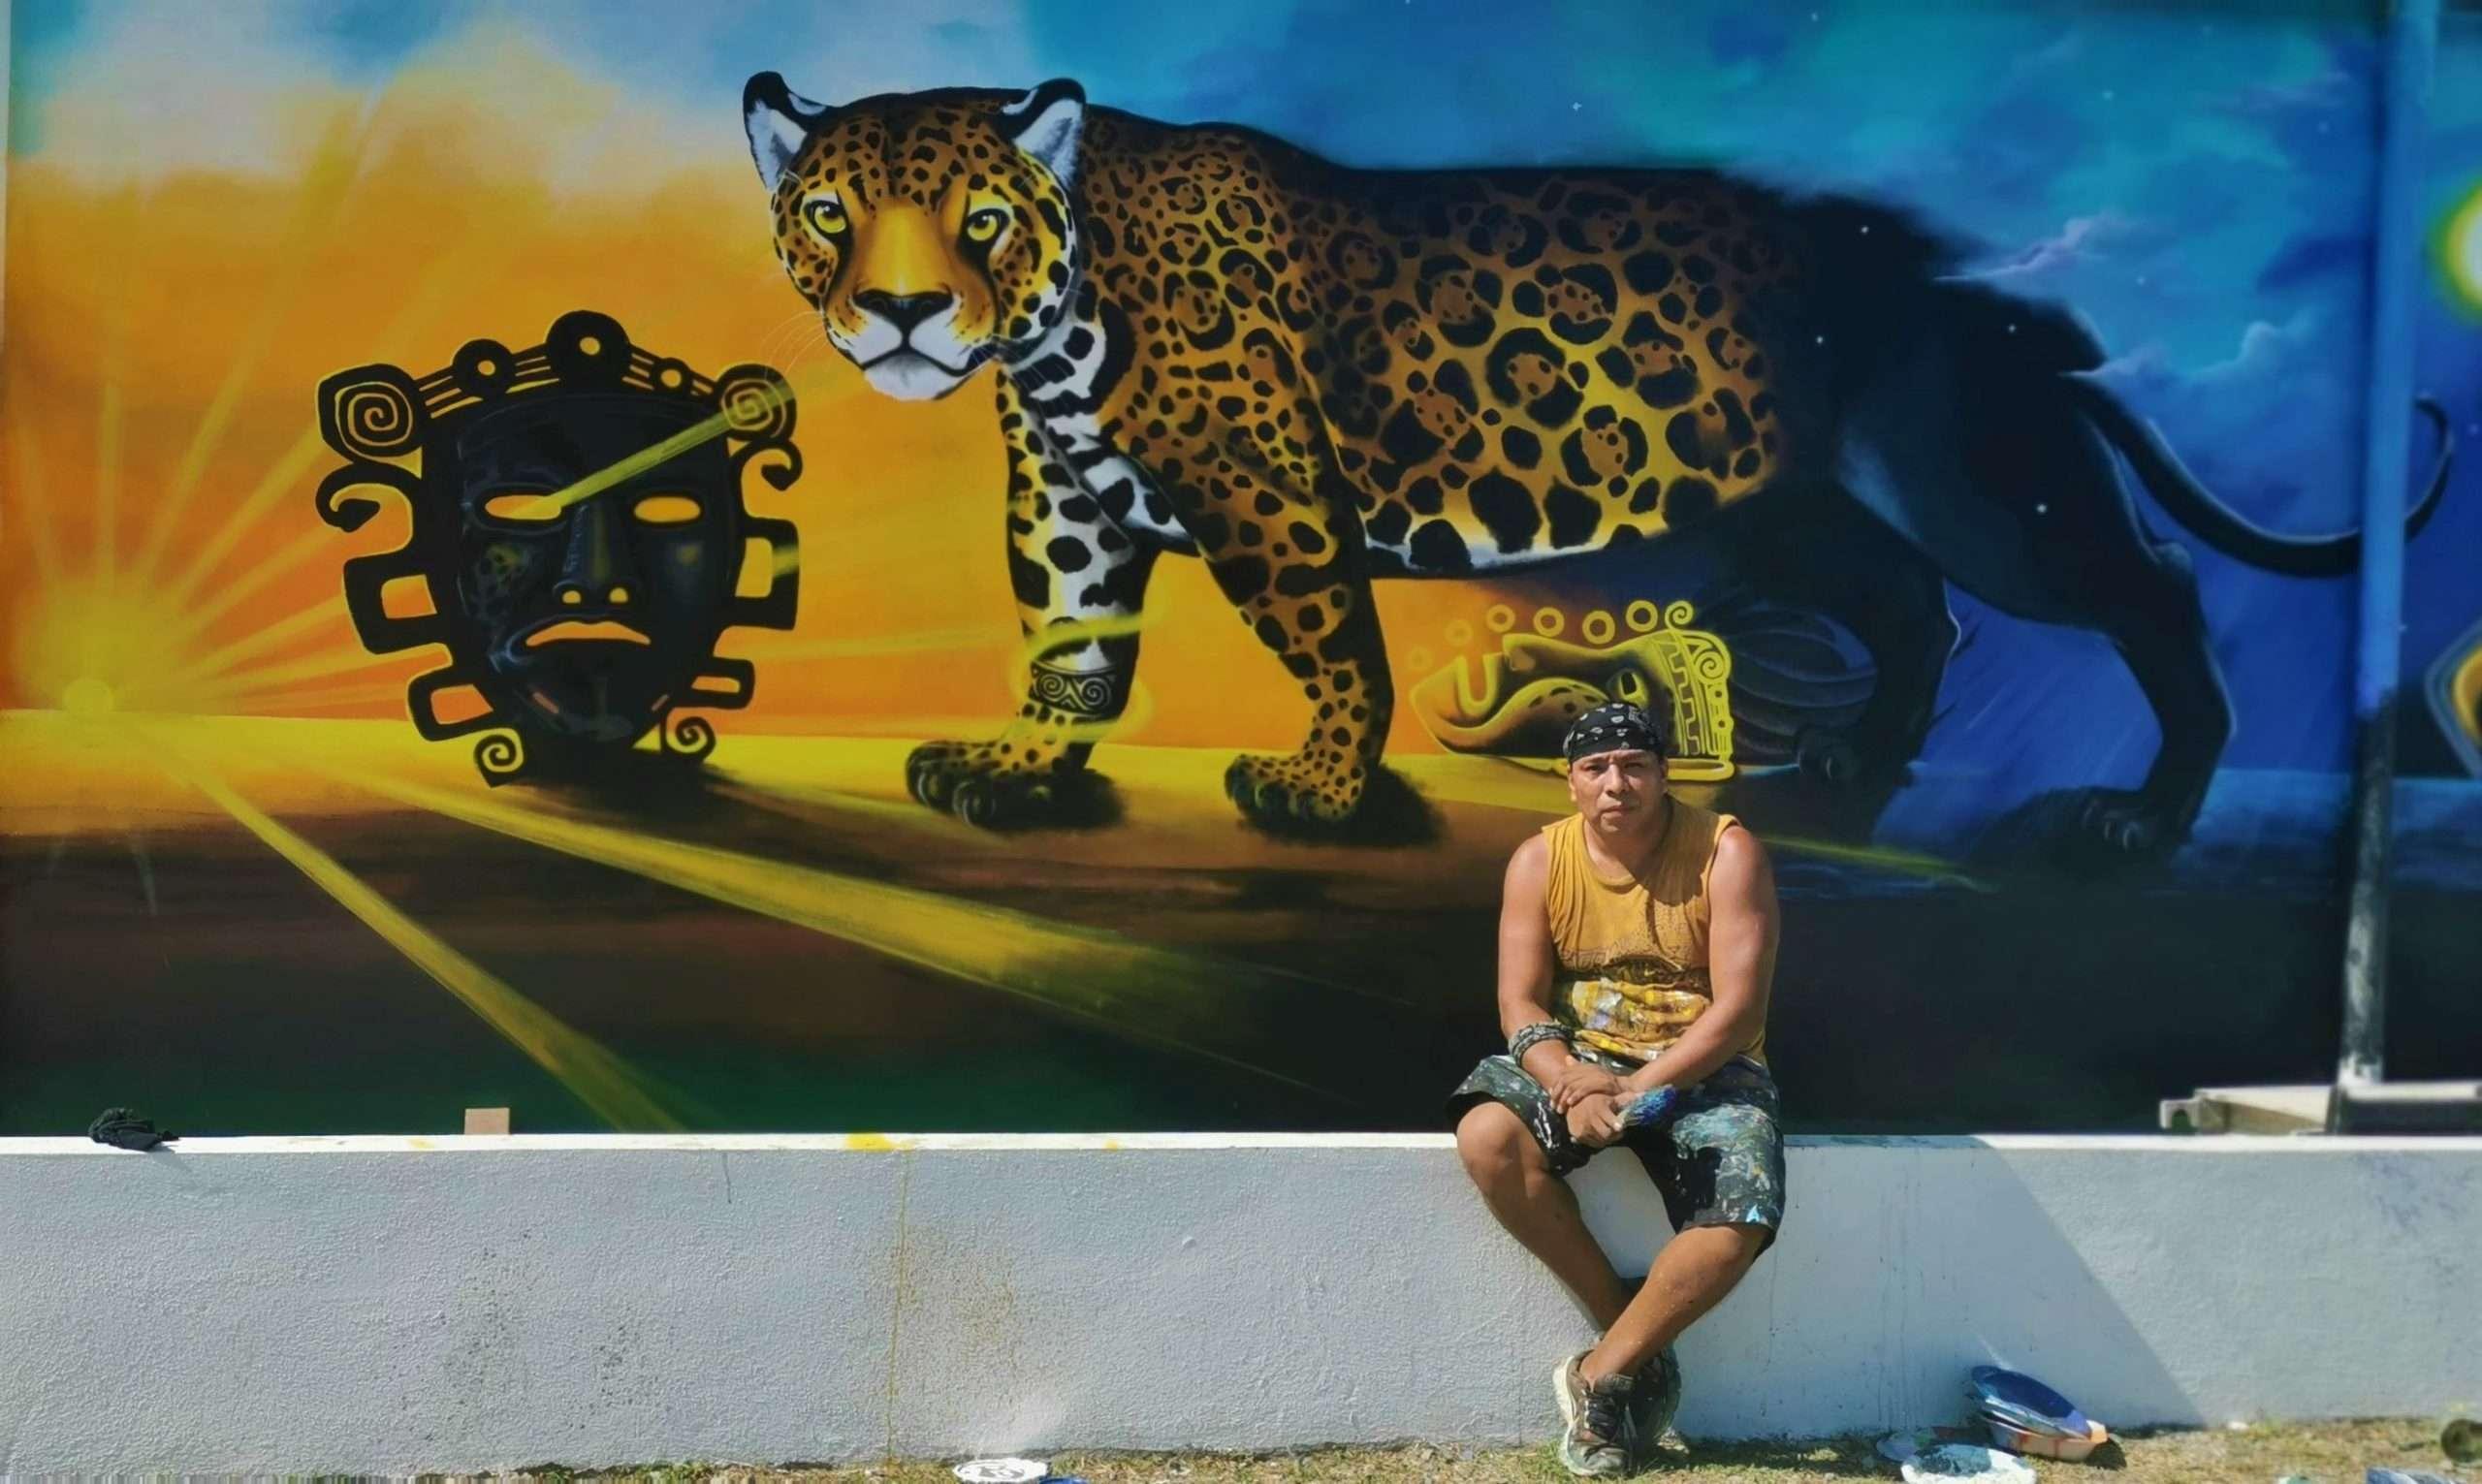 KURA^DENKA, the Footprint of the Jaguar